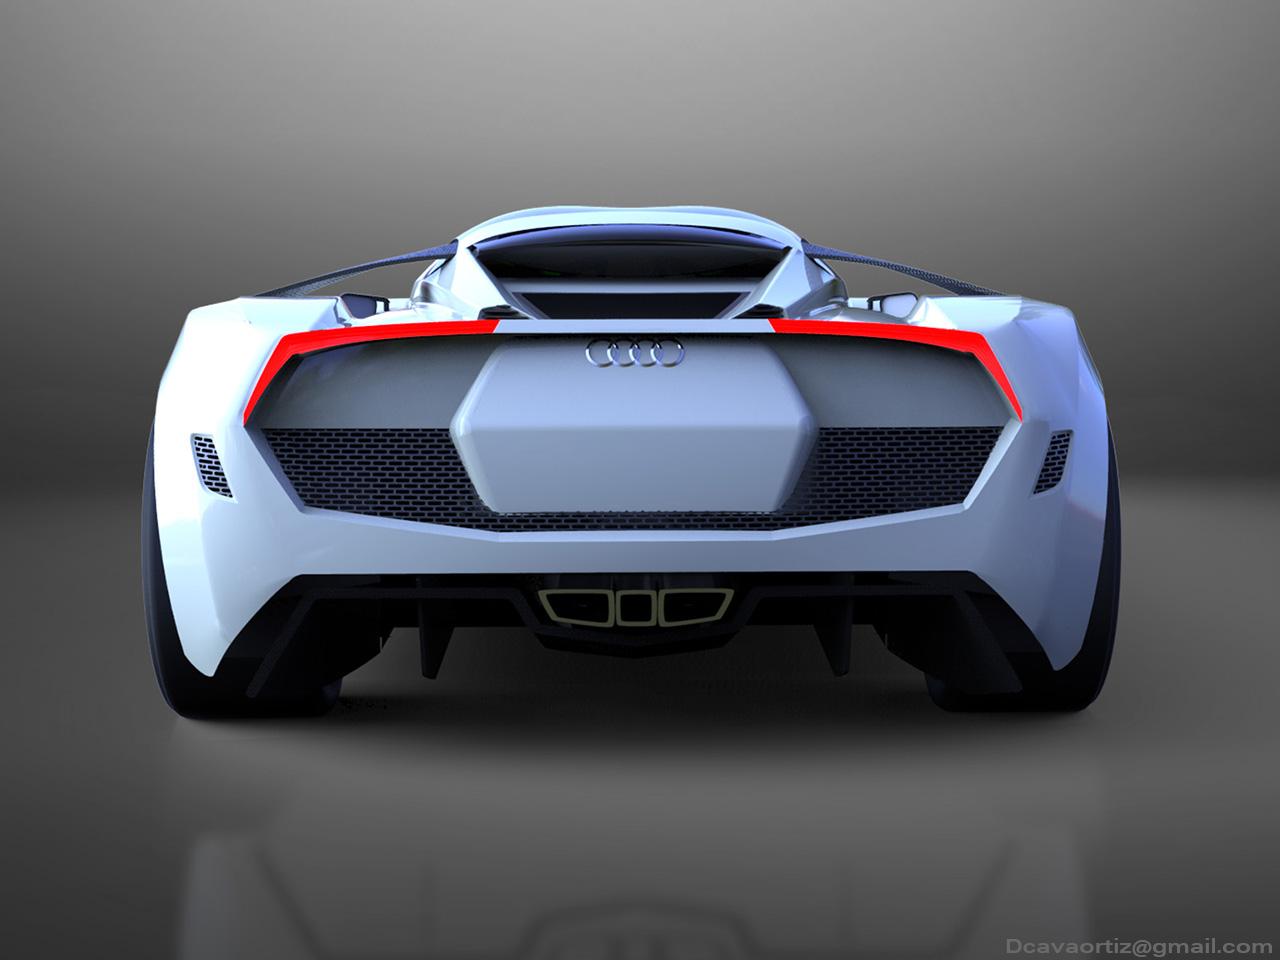 AUDI-A7-audi-23979685-1280-850 Audi A10